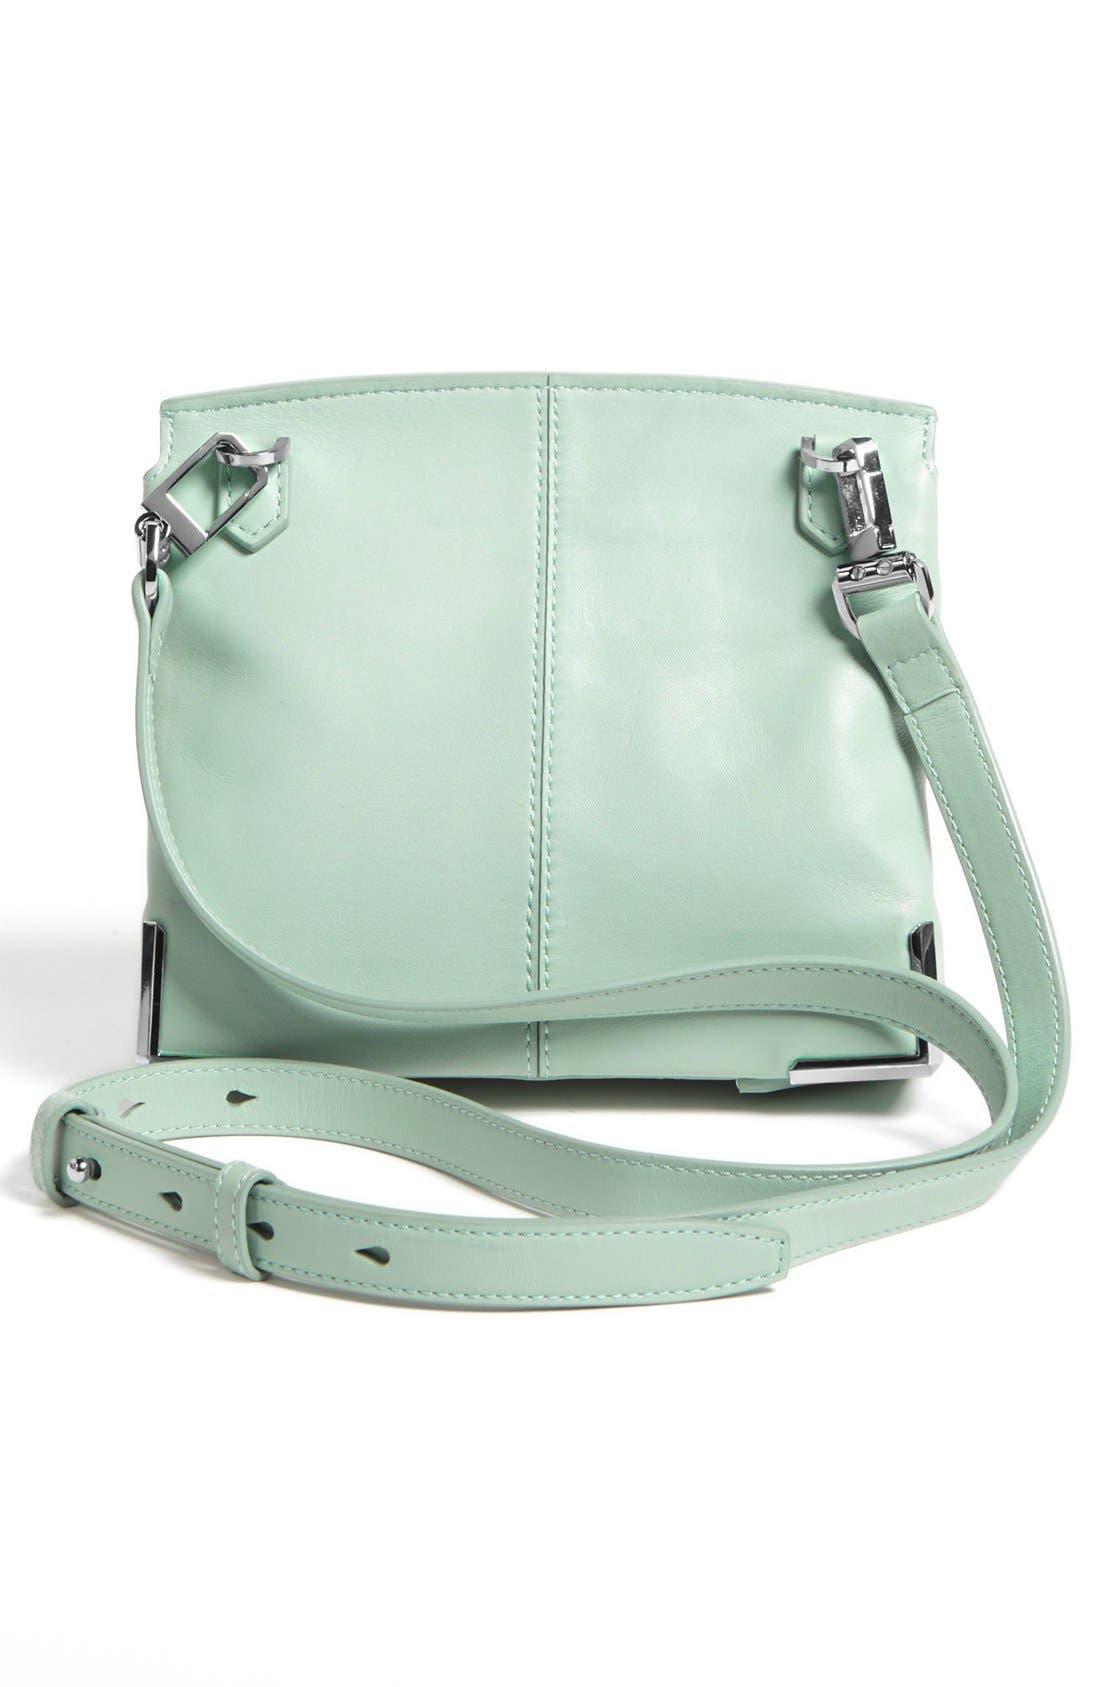 Alternate Image 3  - Alexander Wang 'Marion Mini - Prisma' Leather Crossbody Bag